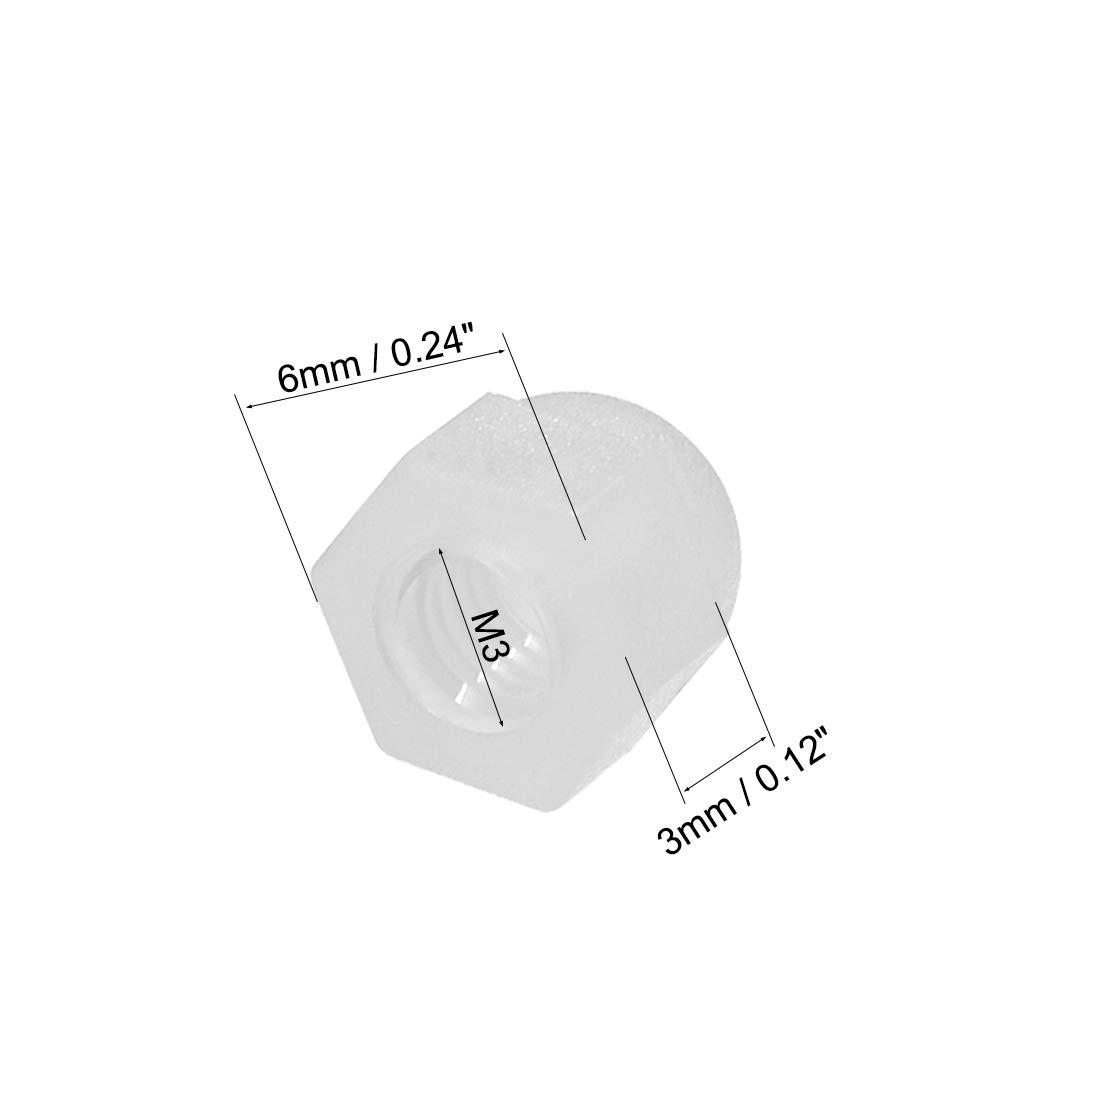 M3 Hutmutter Sechskant Kuppel Kopf Muttern f/ür Schrauben Bolzen Nylon Wei/ß sourcing map 50 Stk